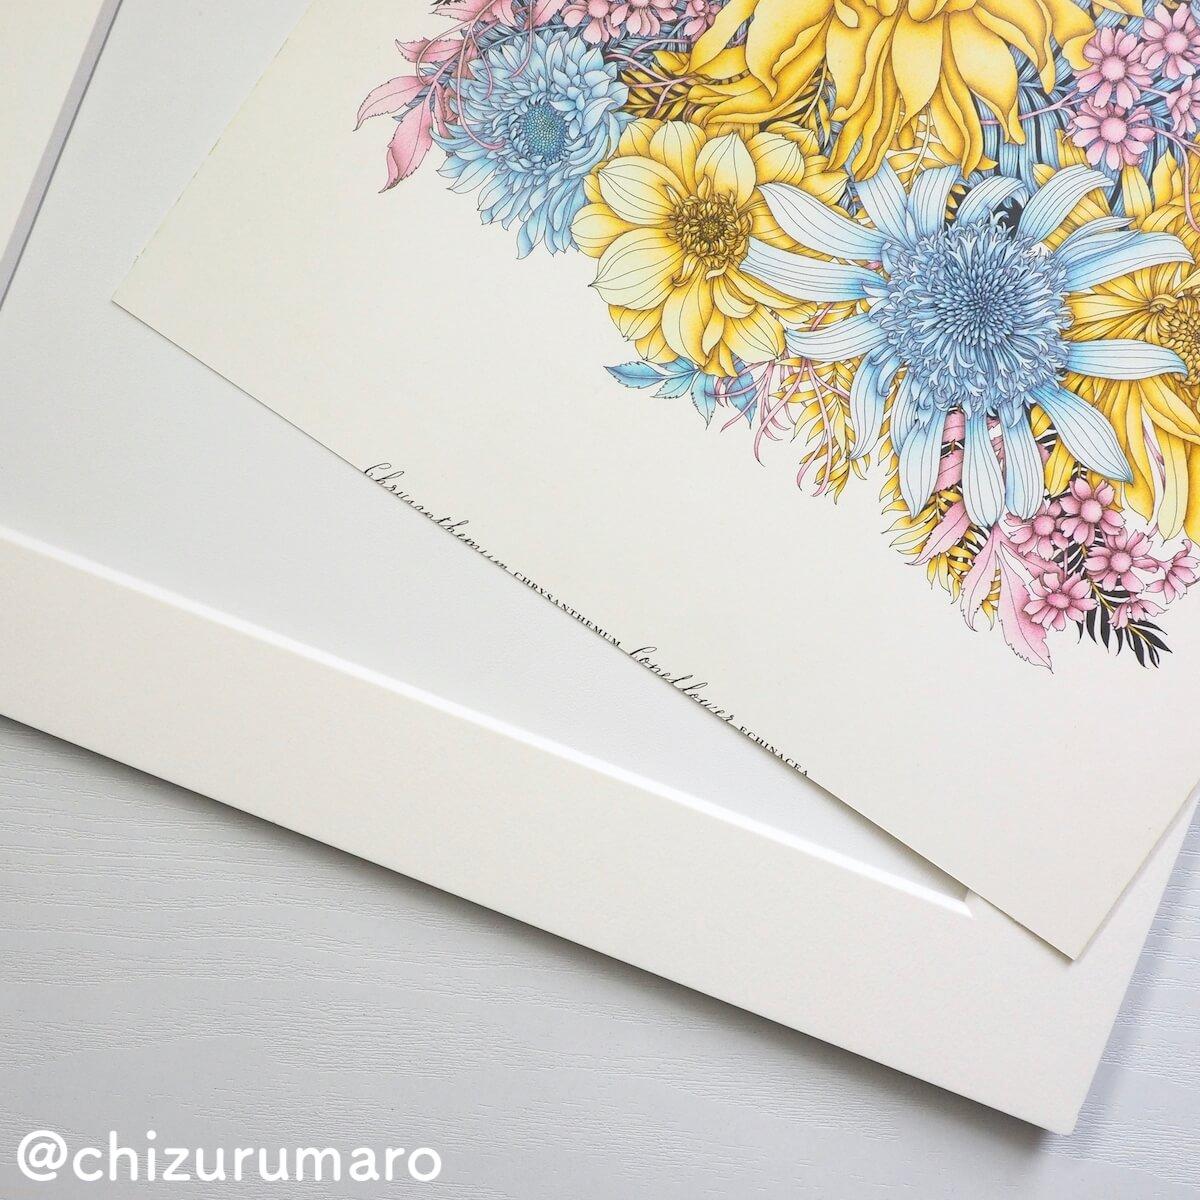 f:id:chizurumaro:20190902160229j:plain